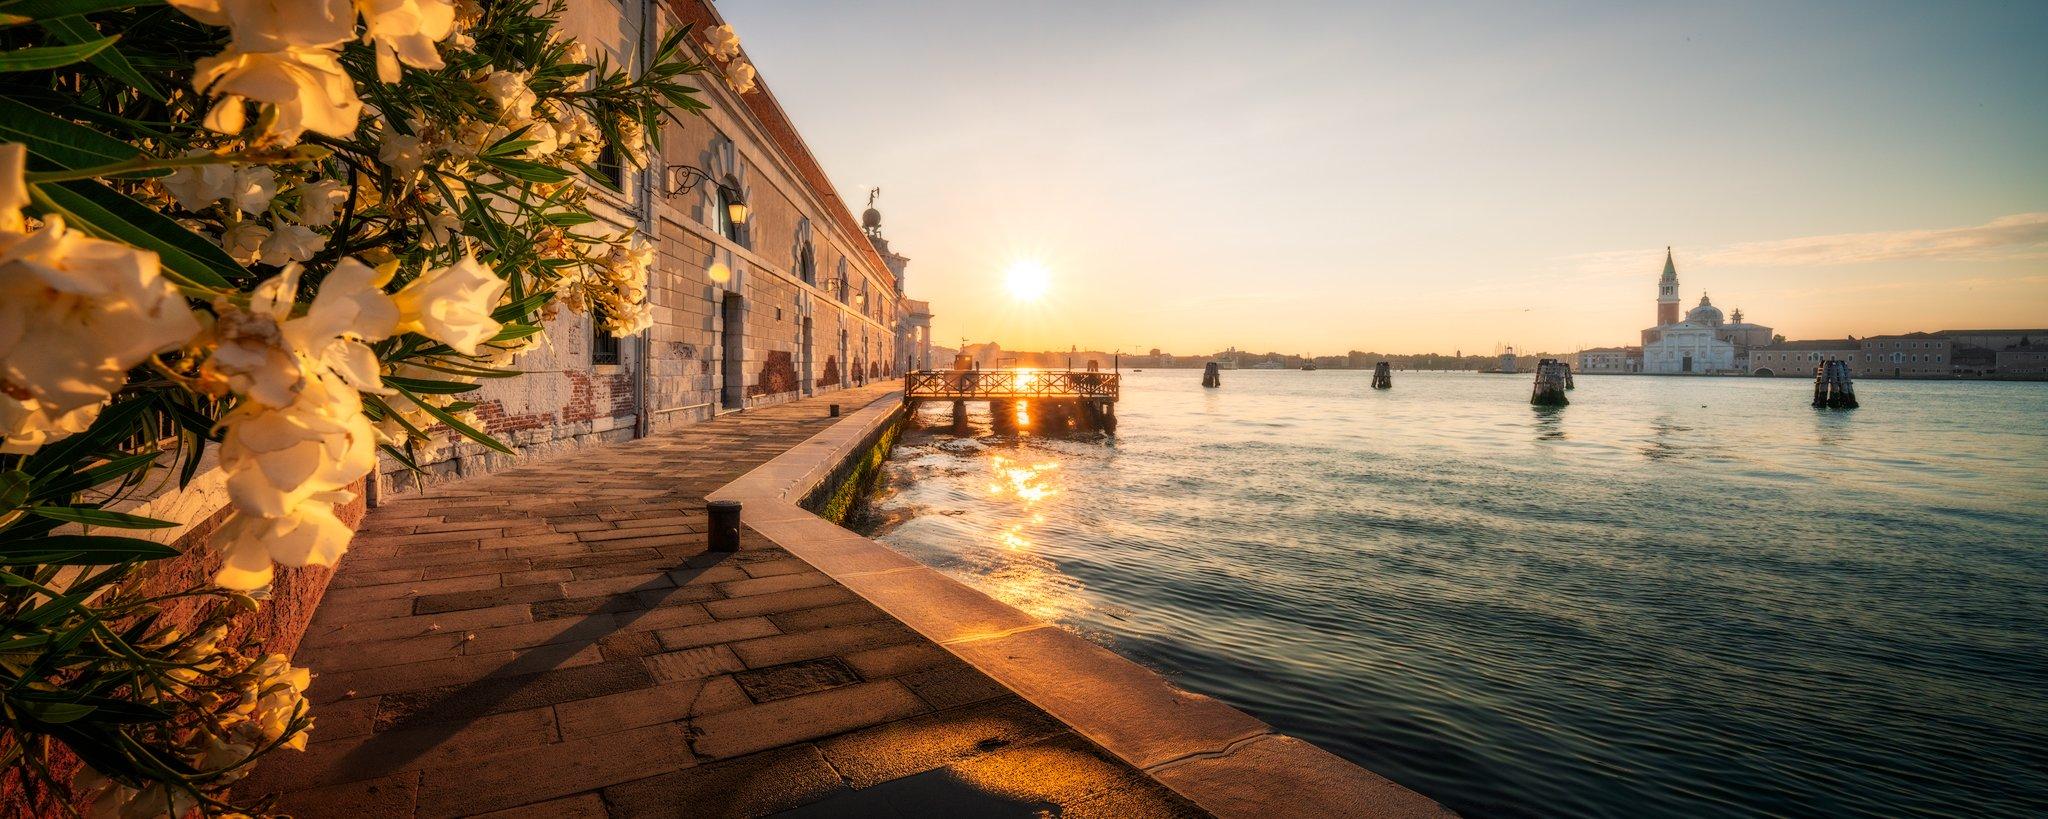 Punta della Dogana overlooking San Marco in Venice, Italy